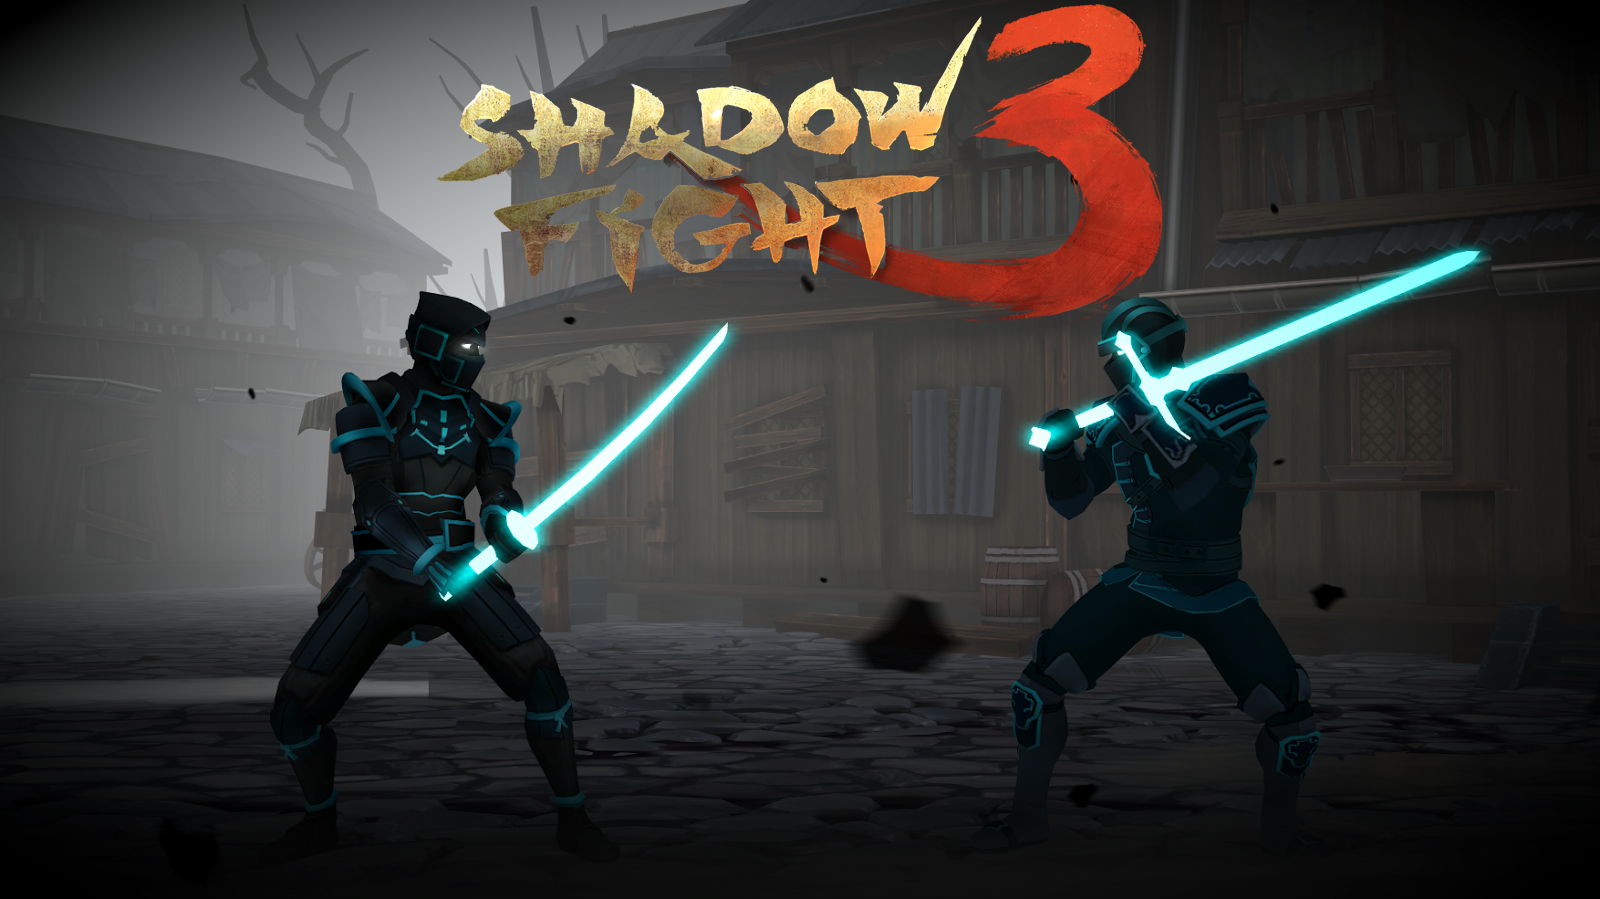 Взломанный Shadow fight 3 на Андроид